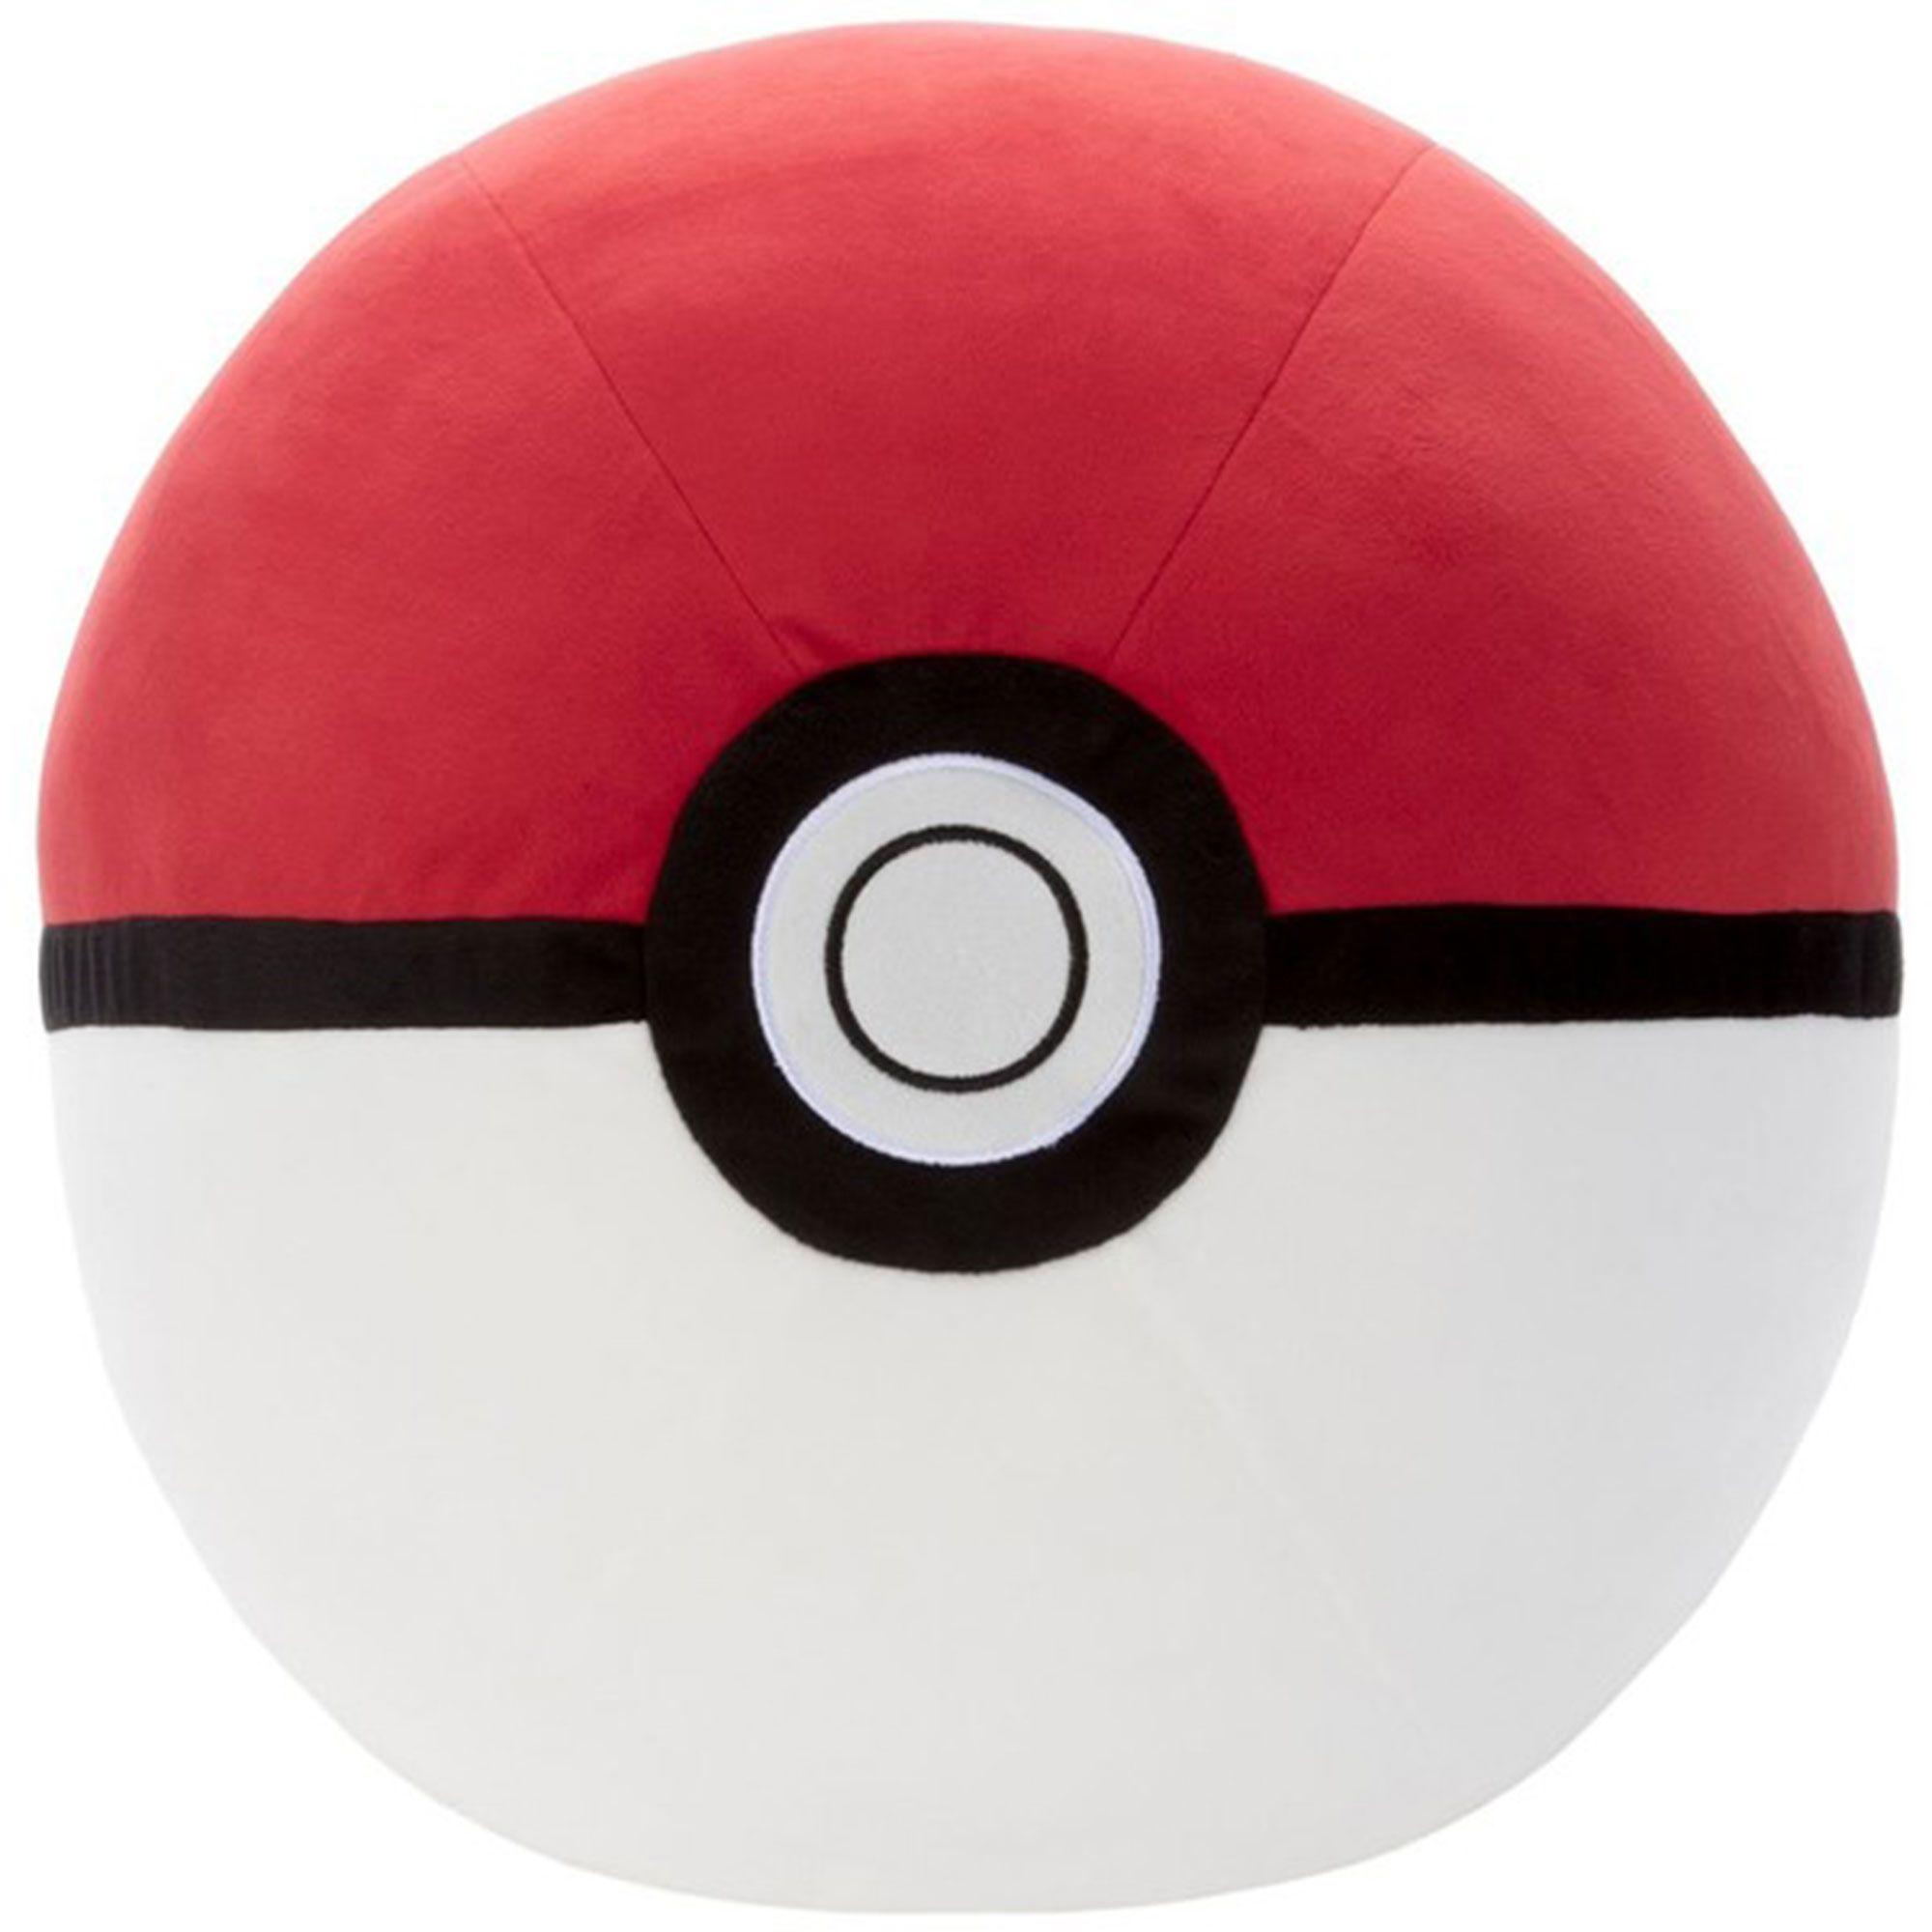 poke-ball-mocchi-mocchi-plush (1)